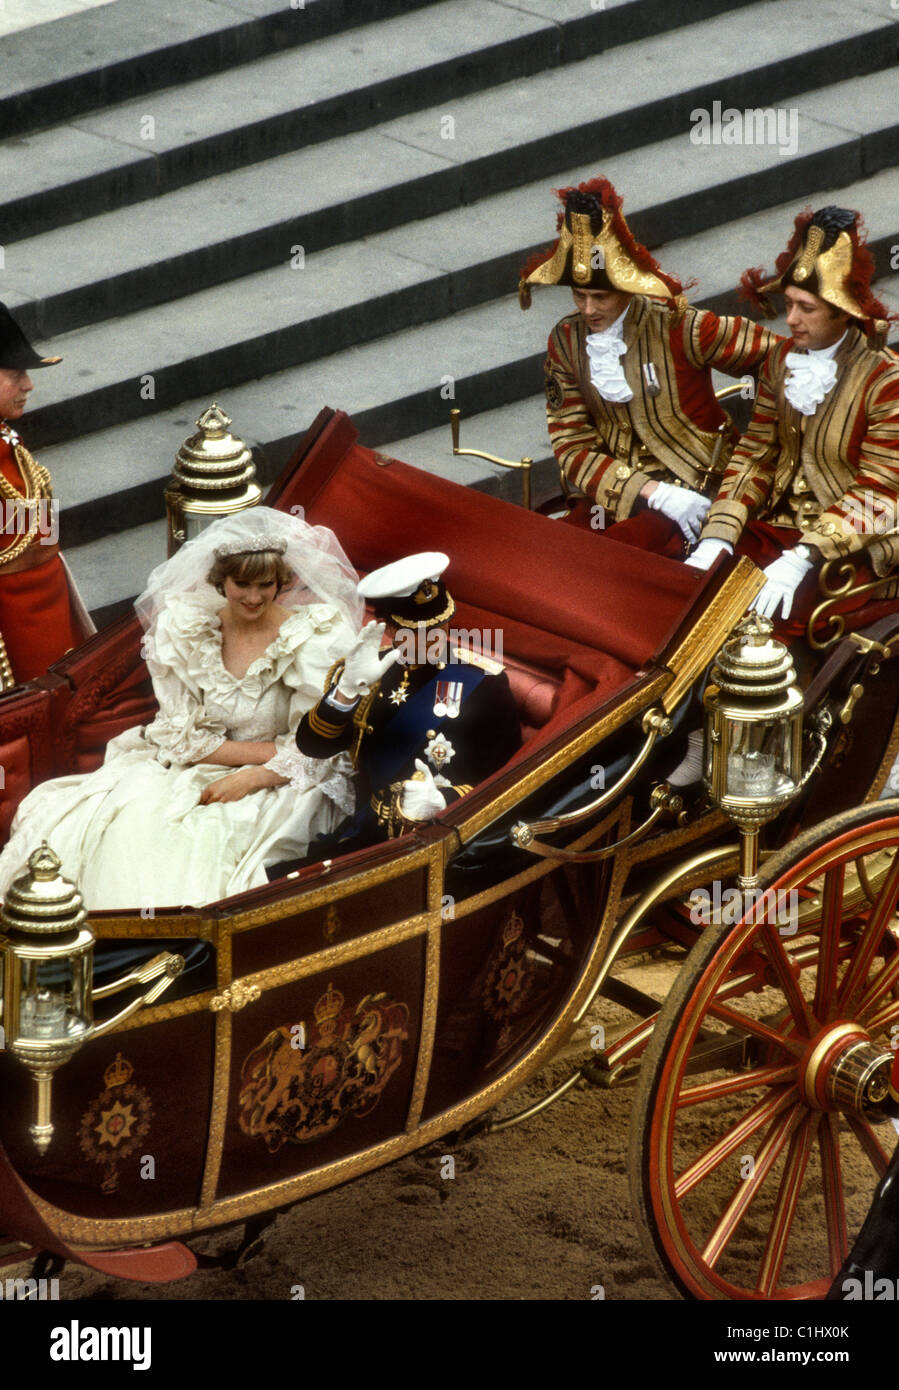 Mariage du Prince Charles et de Lady Diana Spencer Banque D'Images